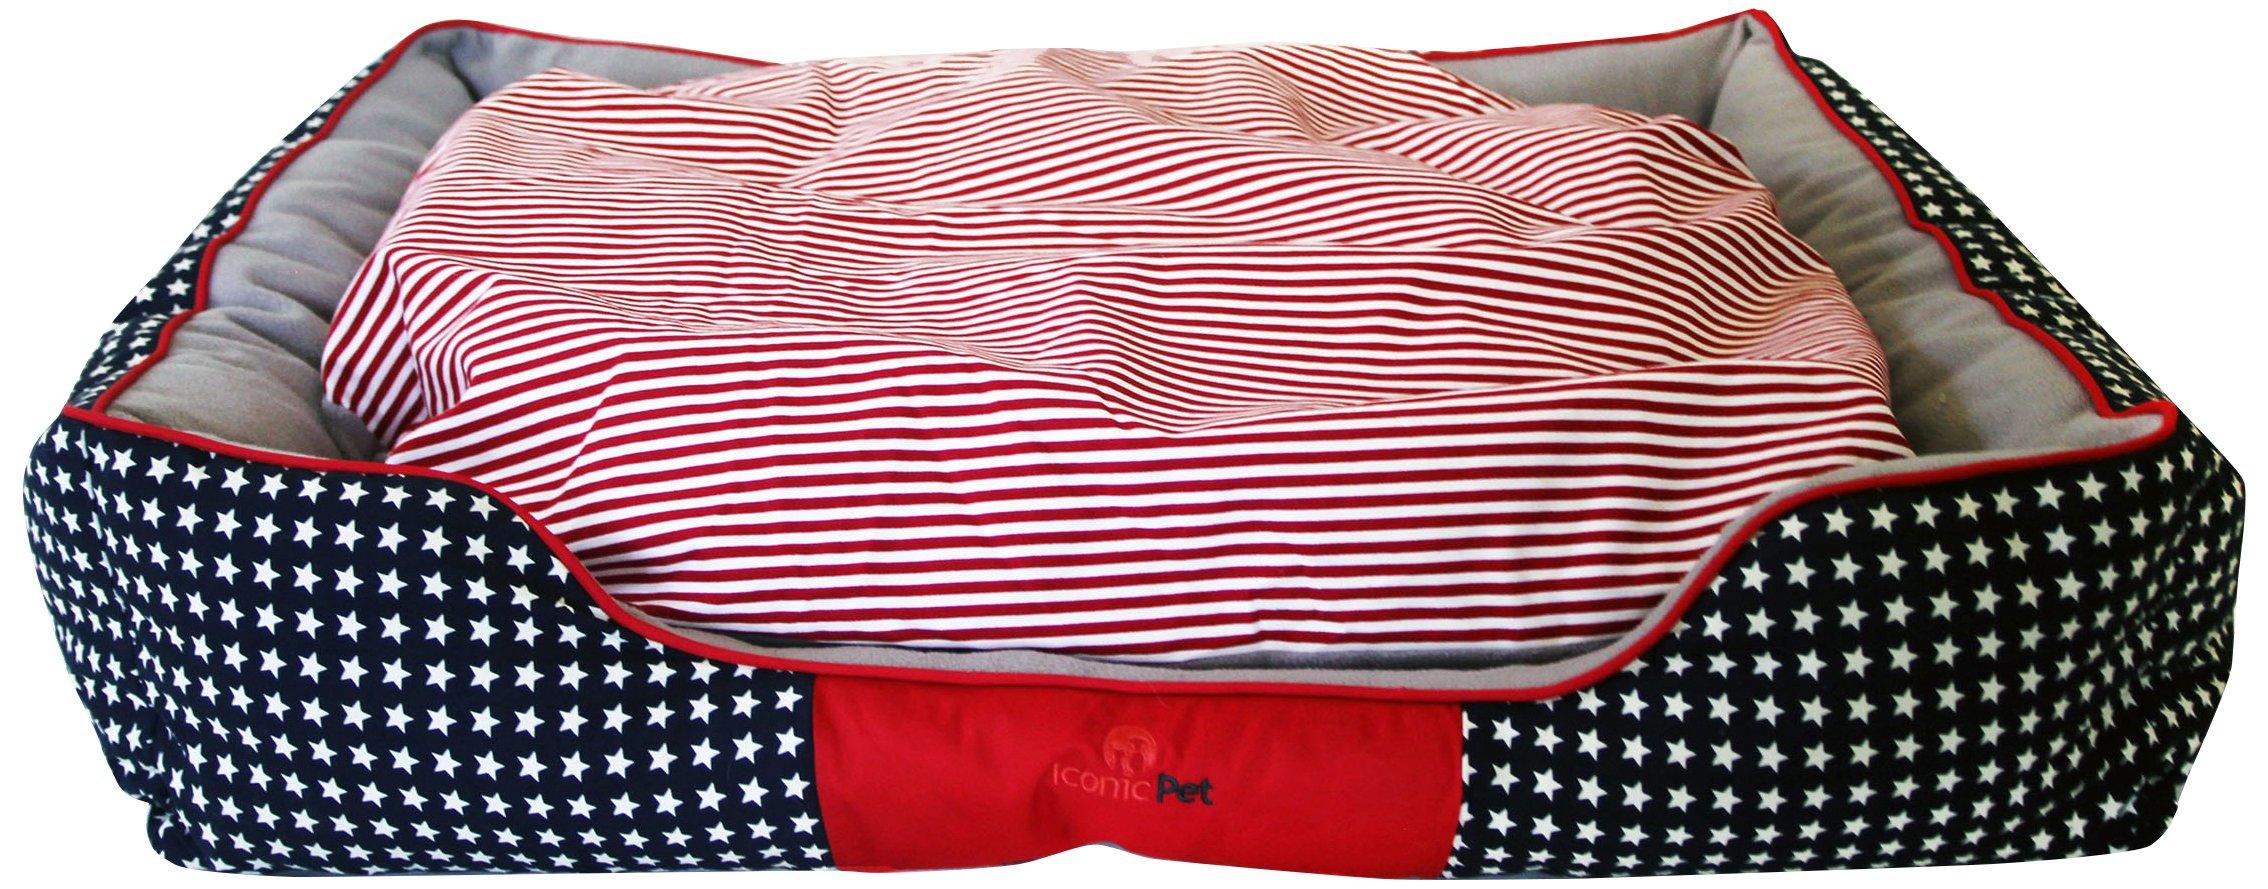 Iconic Pet Freedom Luxury Lounge Beds, Large, Red/White/Blue